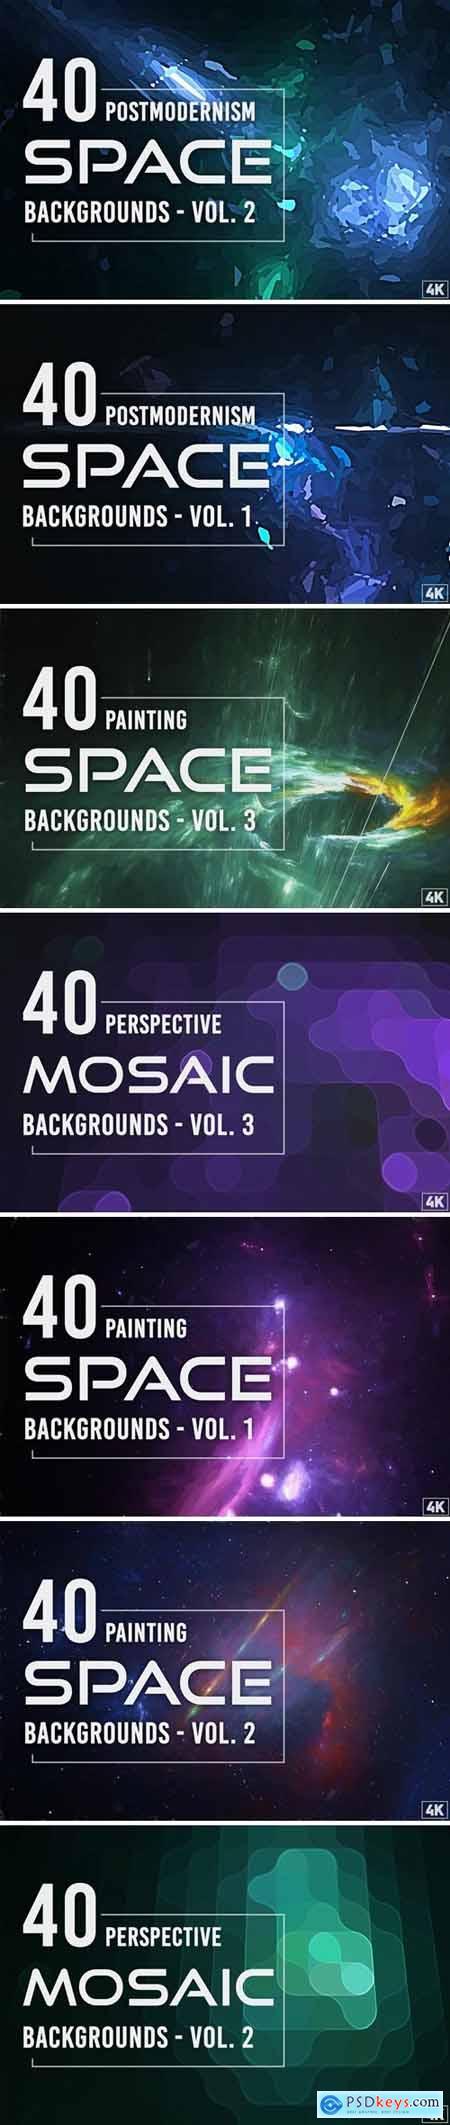 Perspective Mosaic Backgrounds Bundle